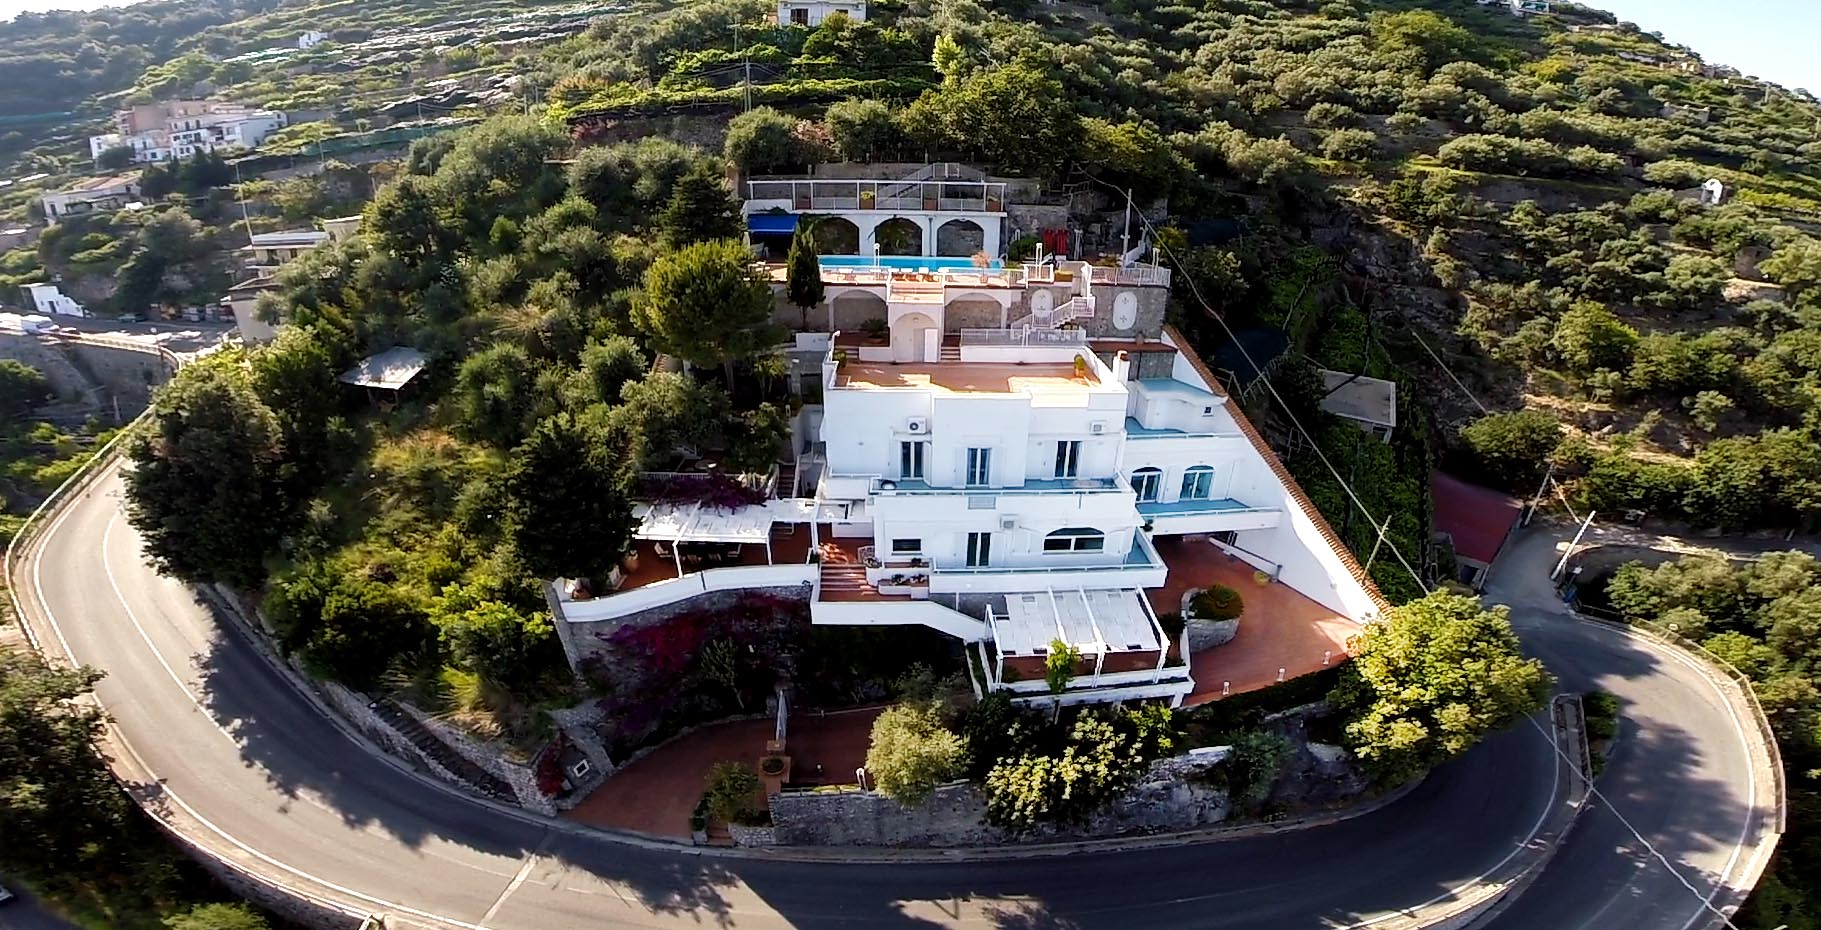 Villa Milu Amalfi_(03).jpg